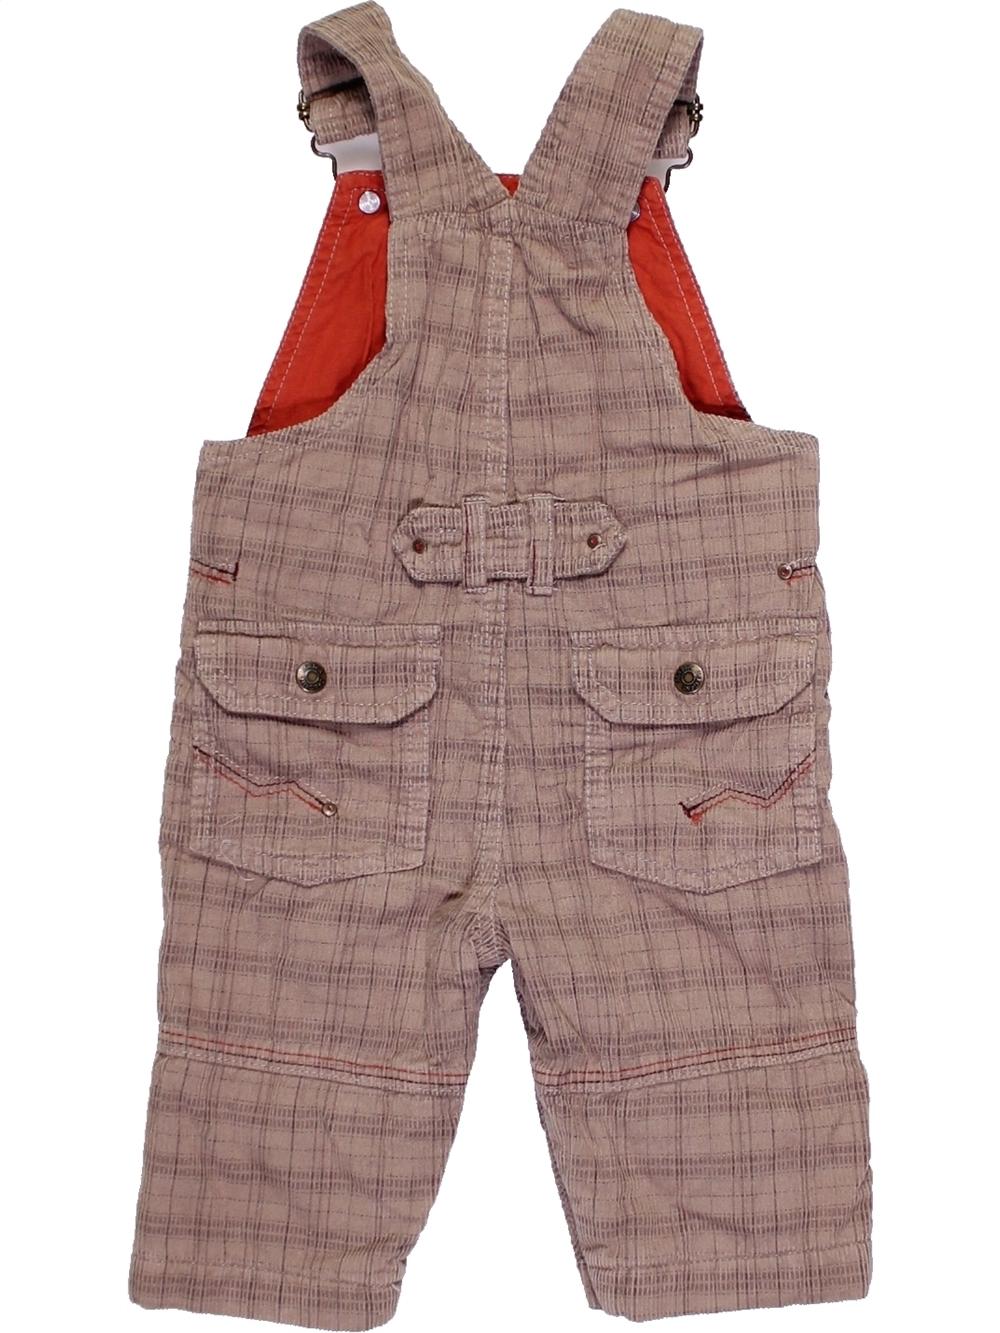 Salopette-bebe-garcon-SERGENT-MAJOR-6-mois-gris-hiver-vetement-bebe-106